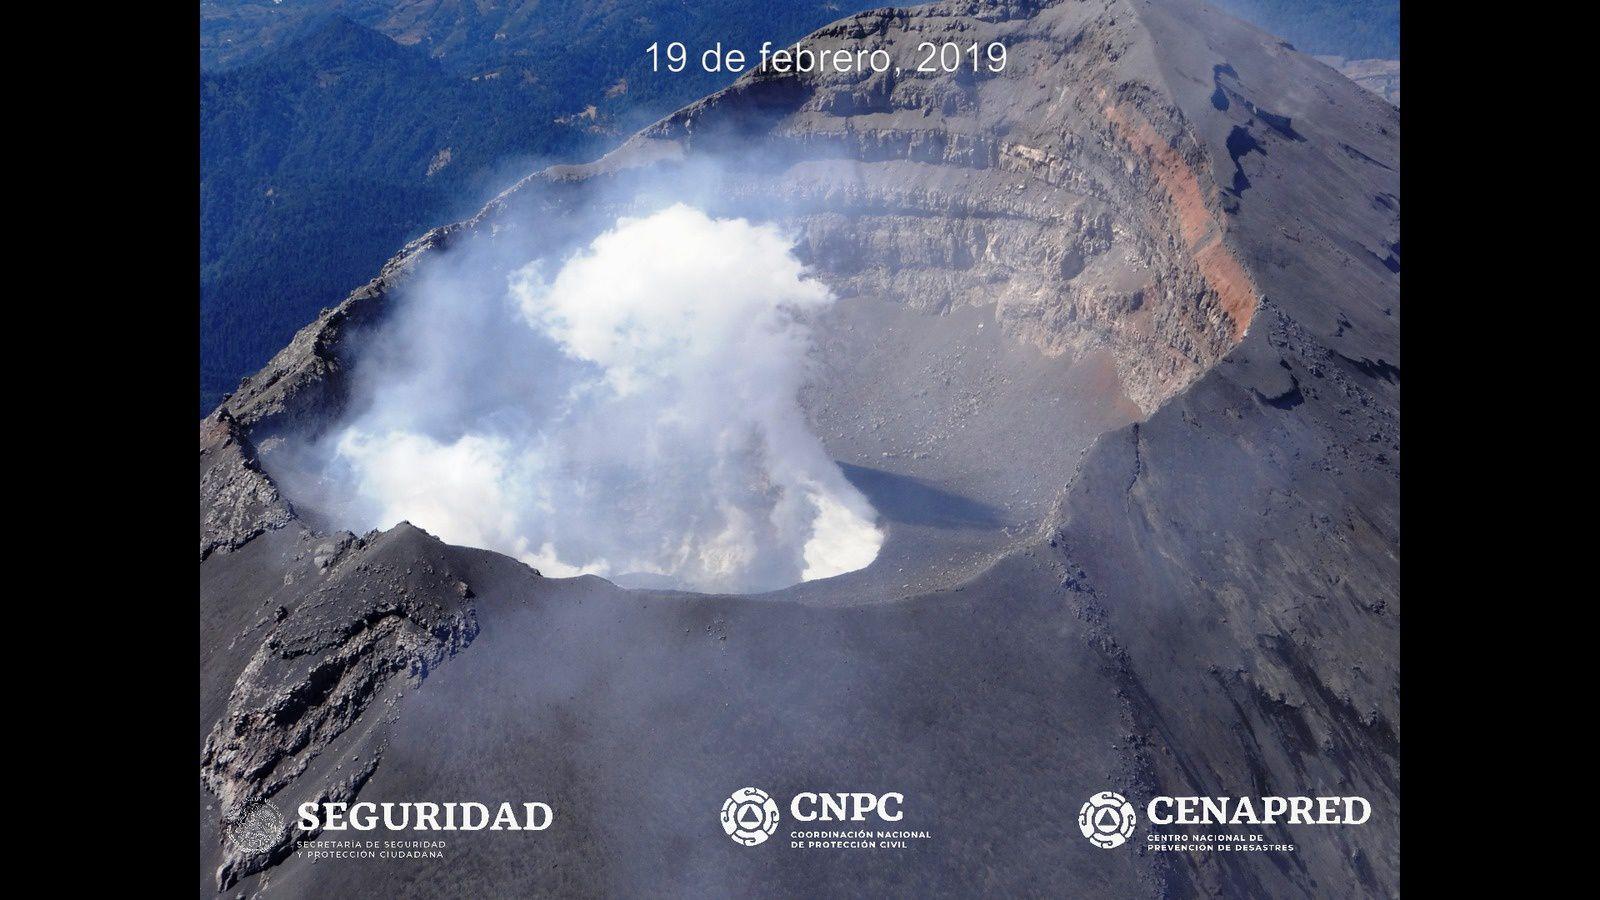 Popocatépetl - 19.02.2019 - formation du dôme de lave n°82 - phptps Cenapred / CNPC / Seguridad